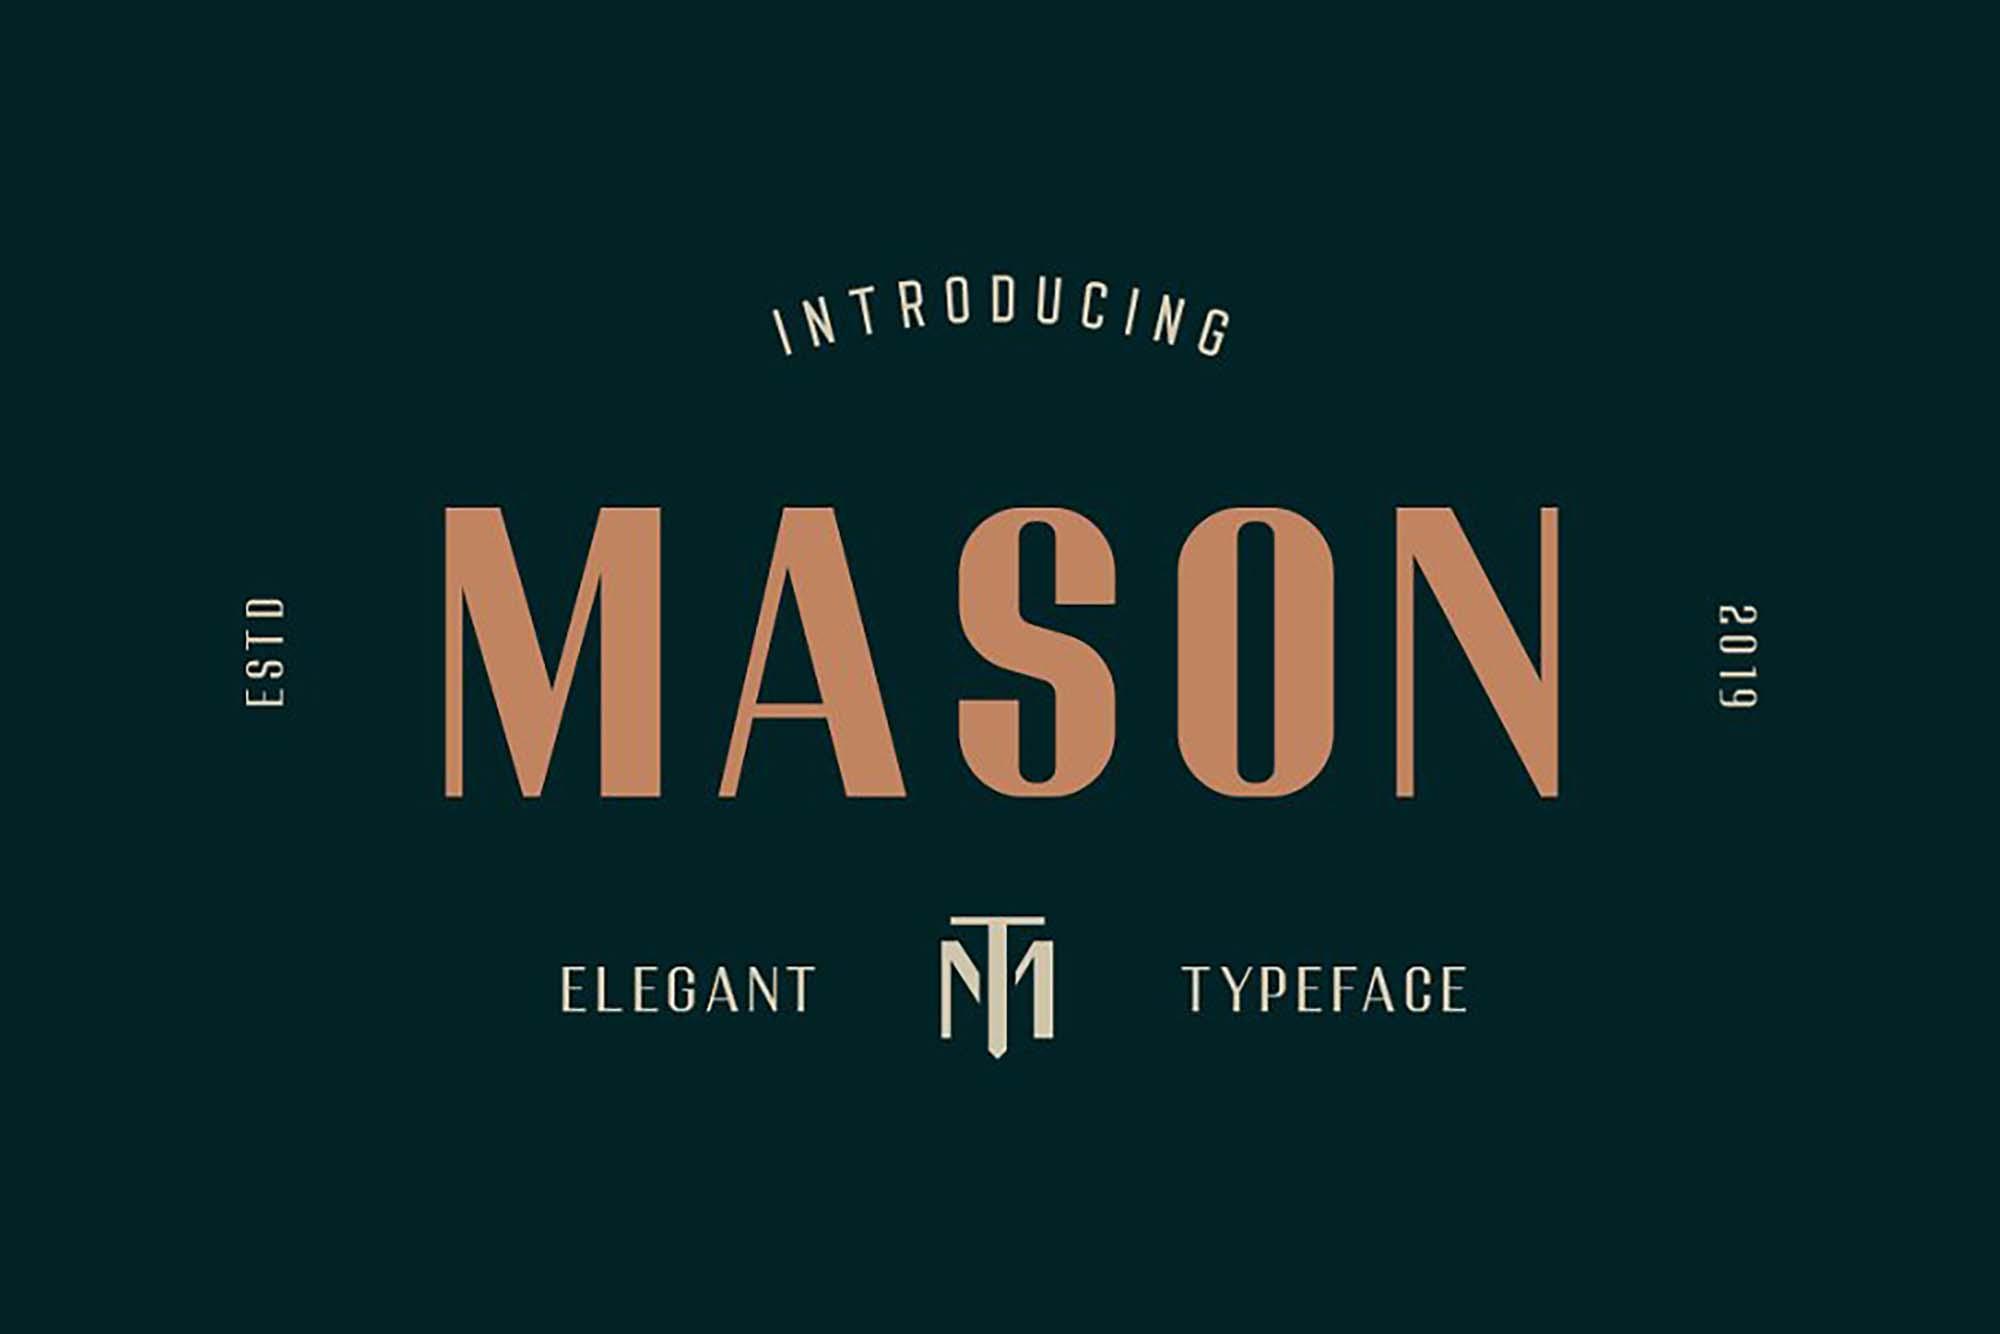 Mason Typeface